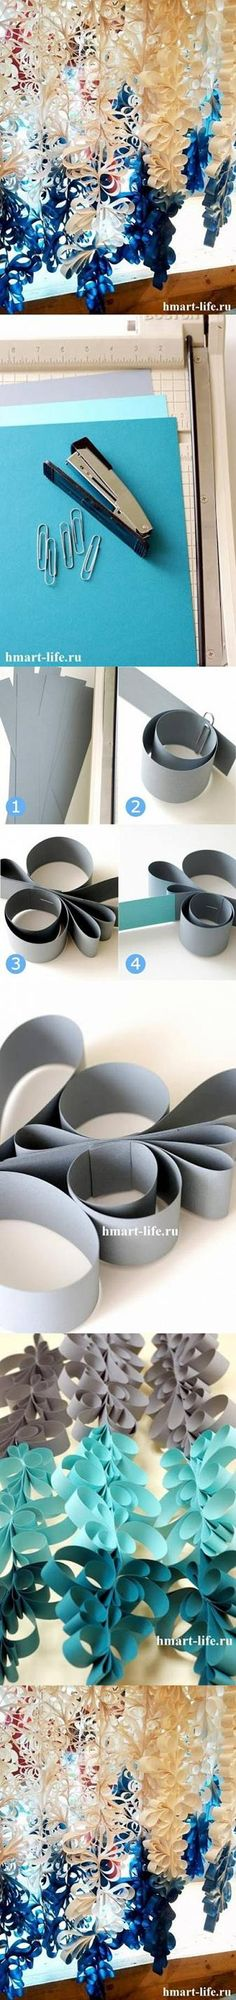 DIY How to Make Garlands DIY Projects | UsefulDIY.com